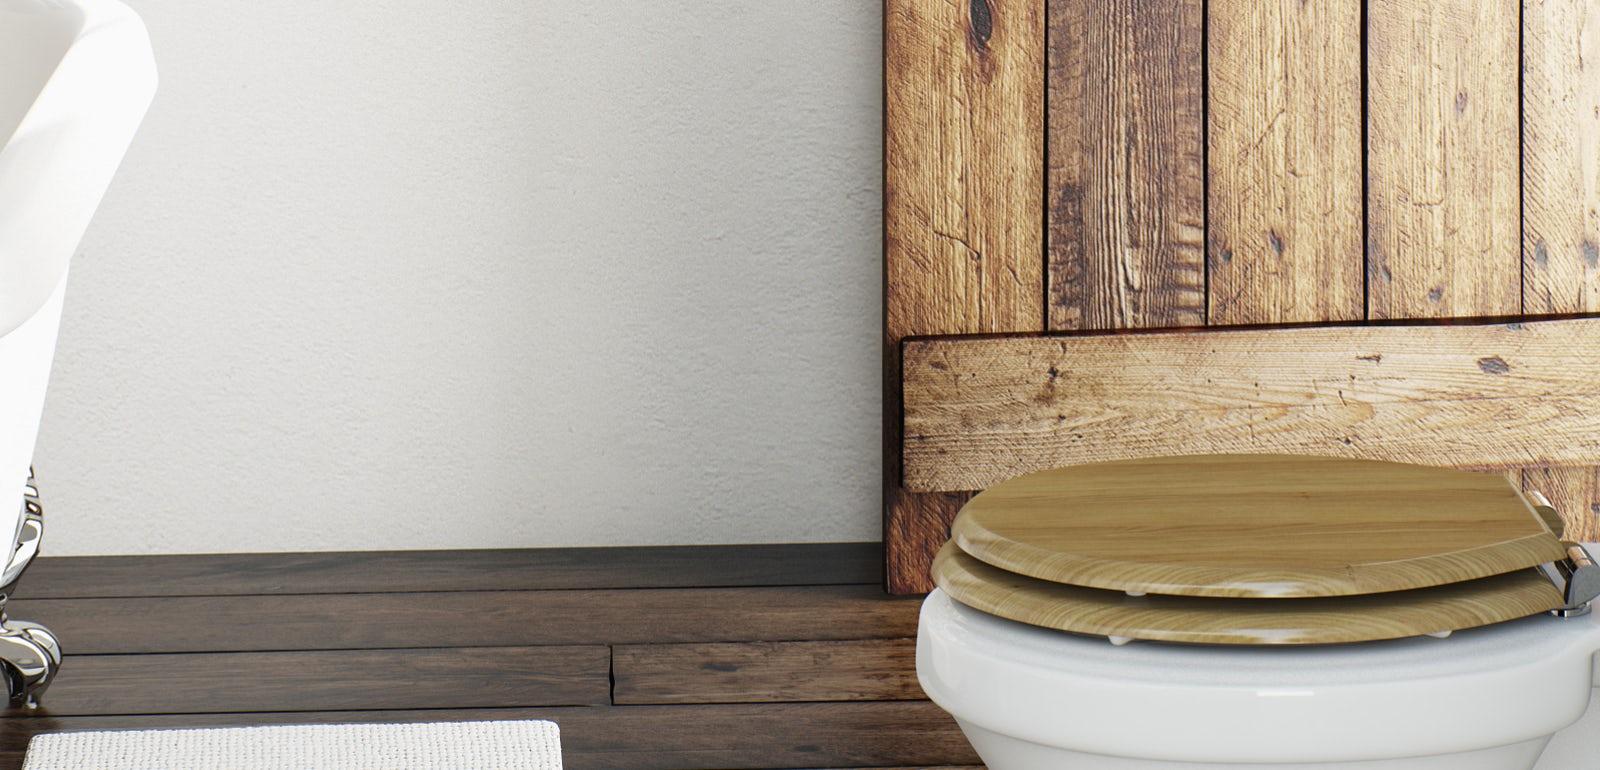 Toilet Comforts Plastic Or Wood Victoriaplum Com